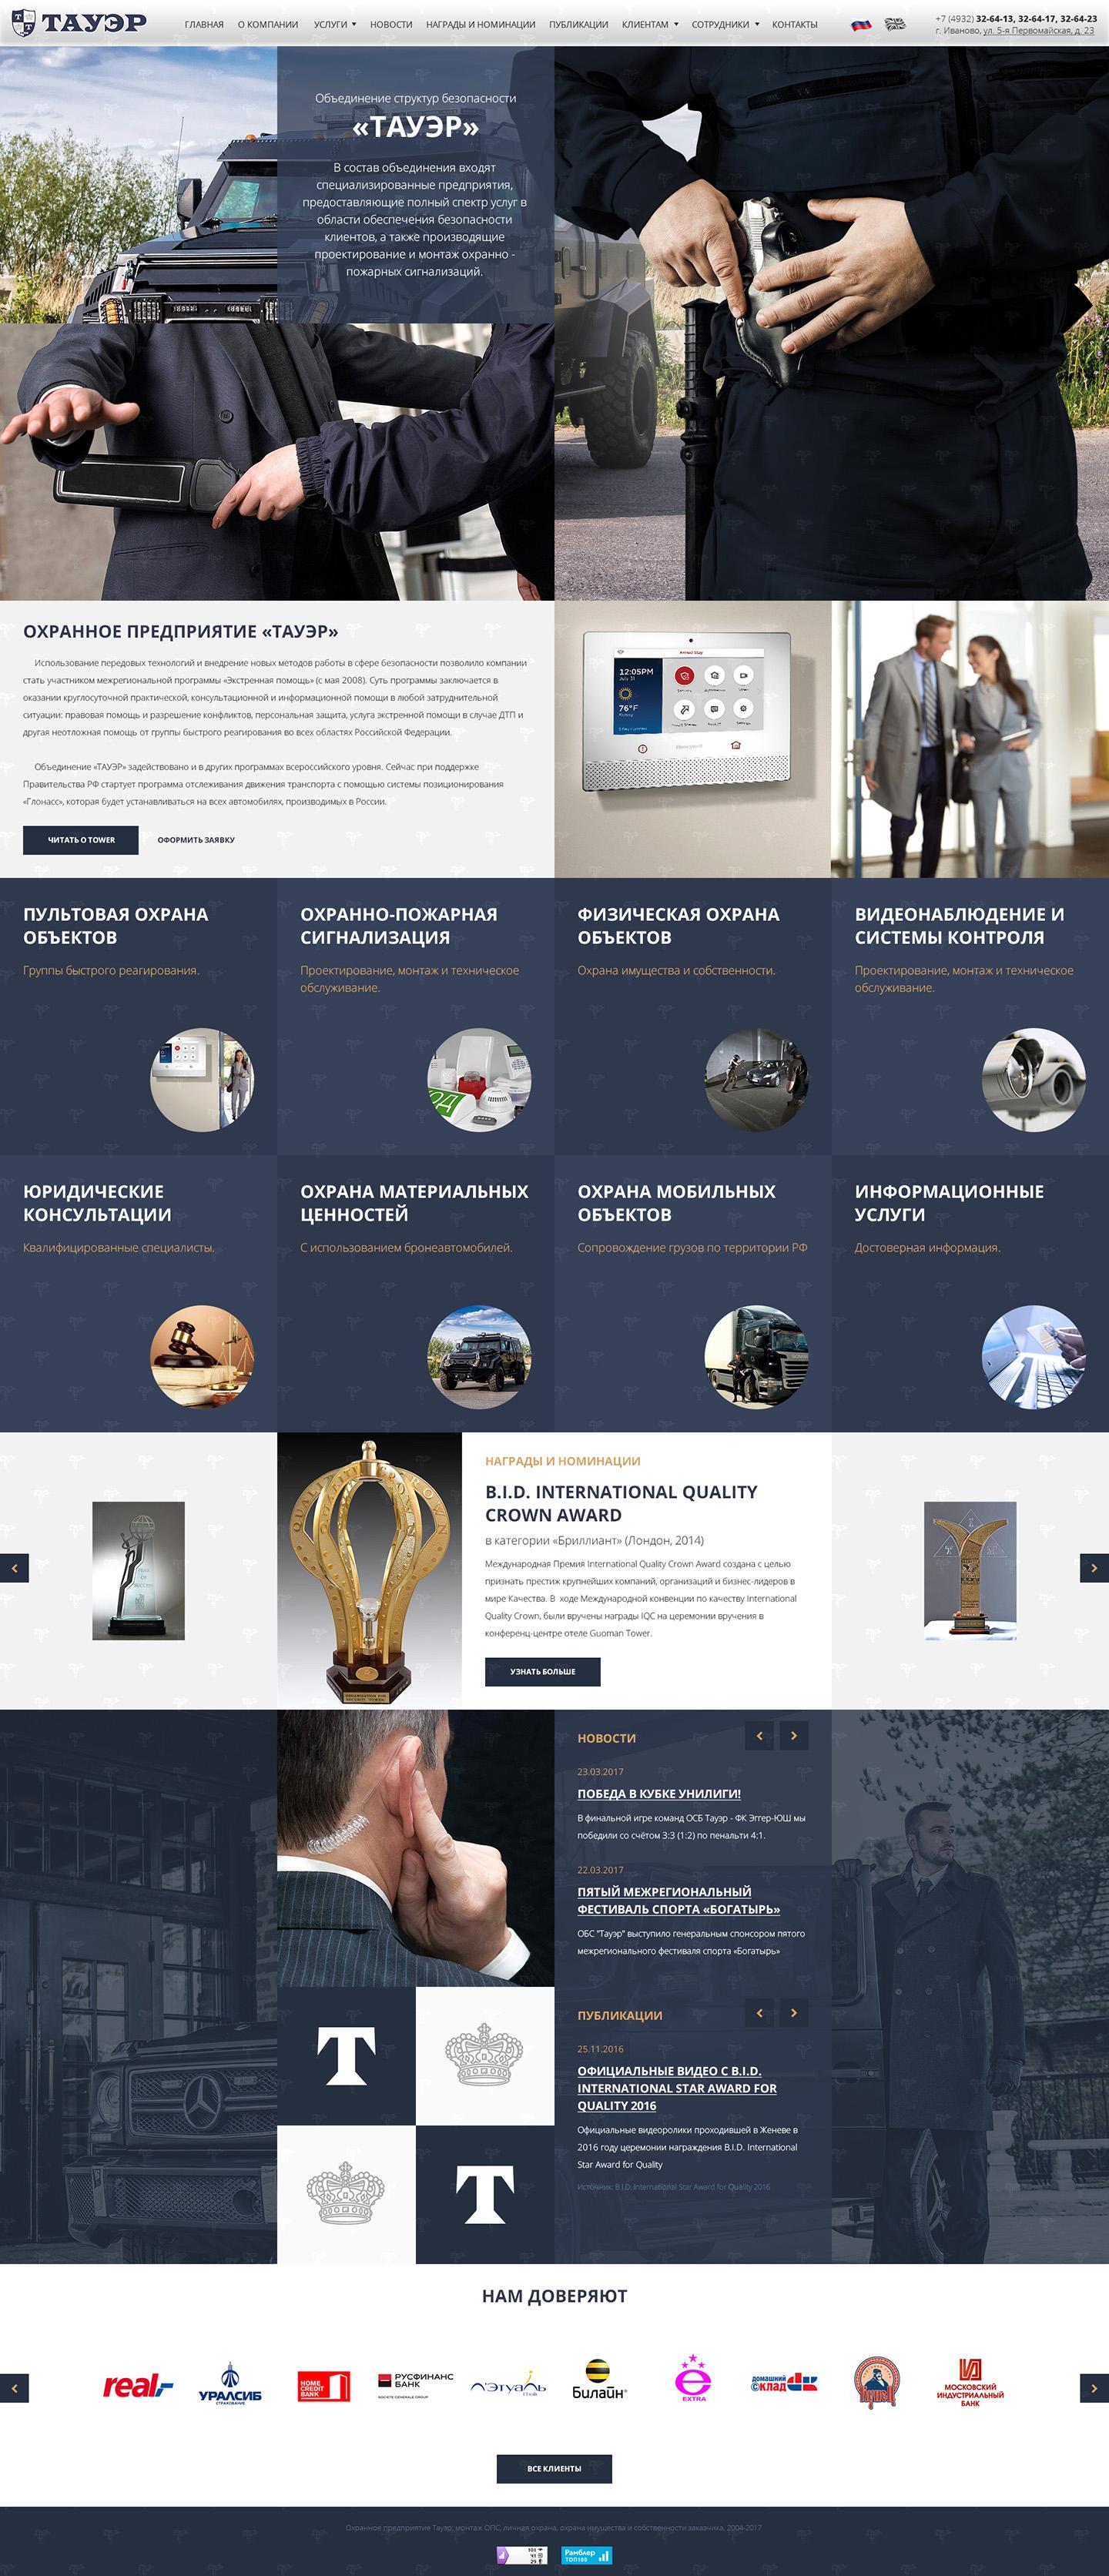 Редизайн существующего сайта компании (ЗАВЕРШЁН) фото f_22358f74f1698aa8.jpg